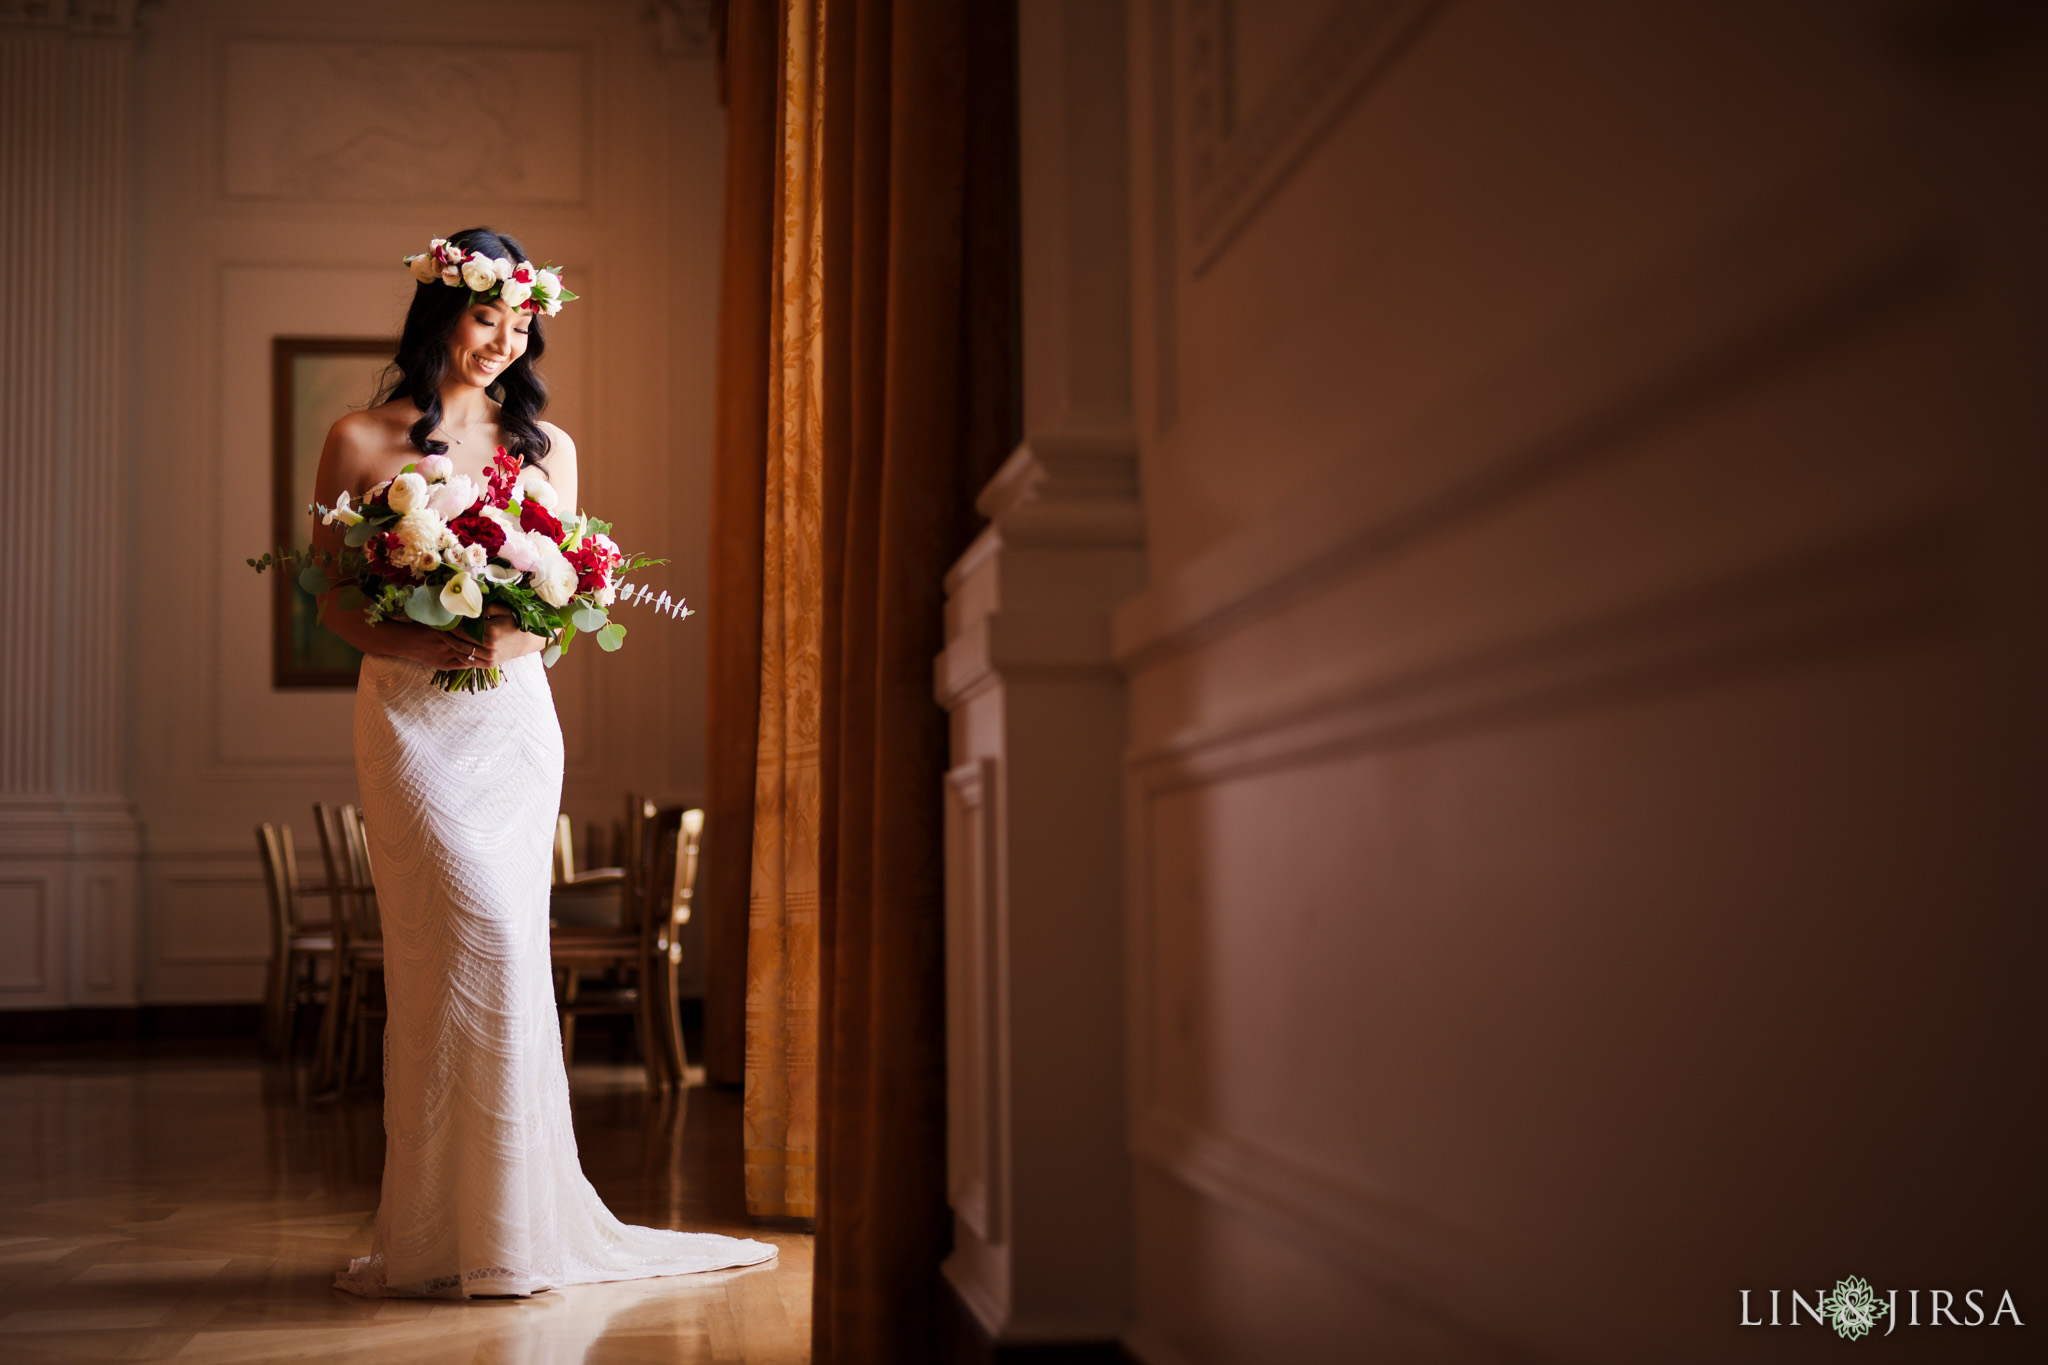 005 richard nixon library bride wedding photography